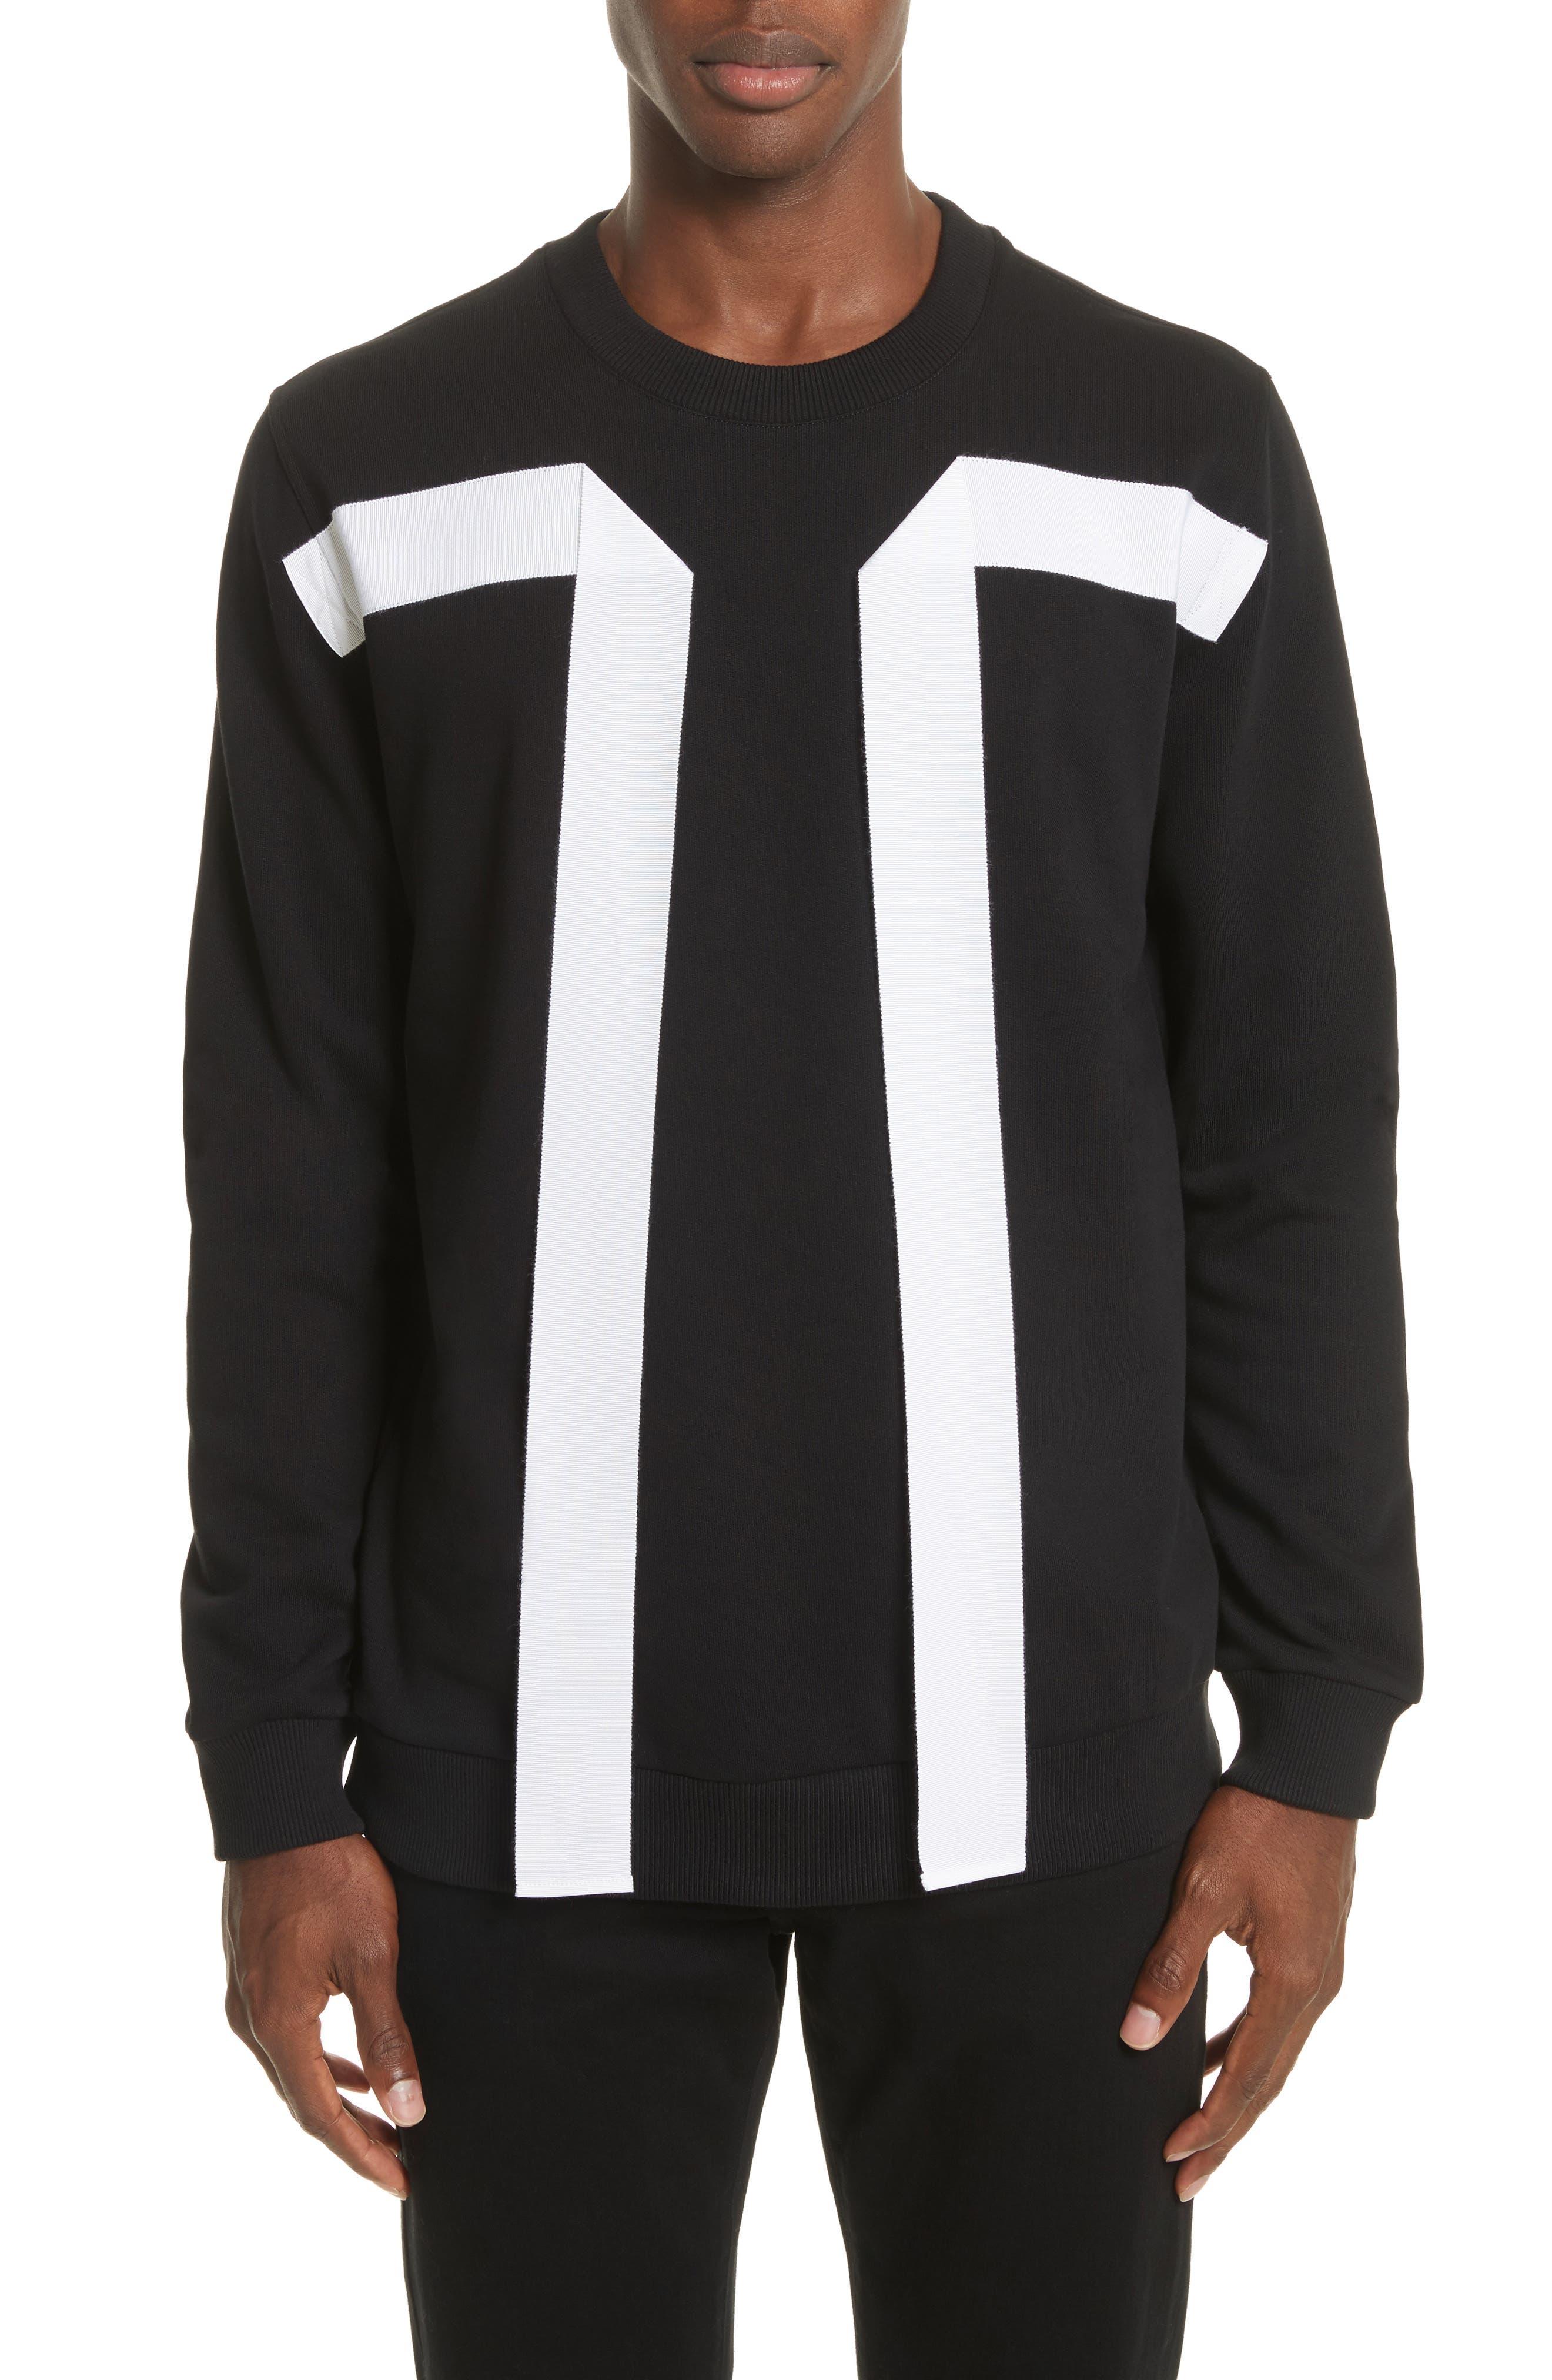 Flying Bands Crewneck Sweatshirt,                             Main thumbnail 1, color,                             Black